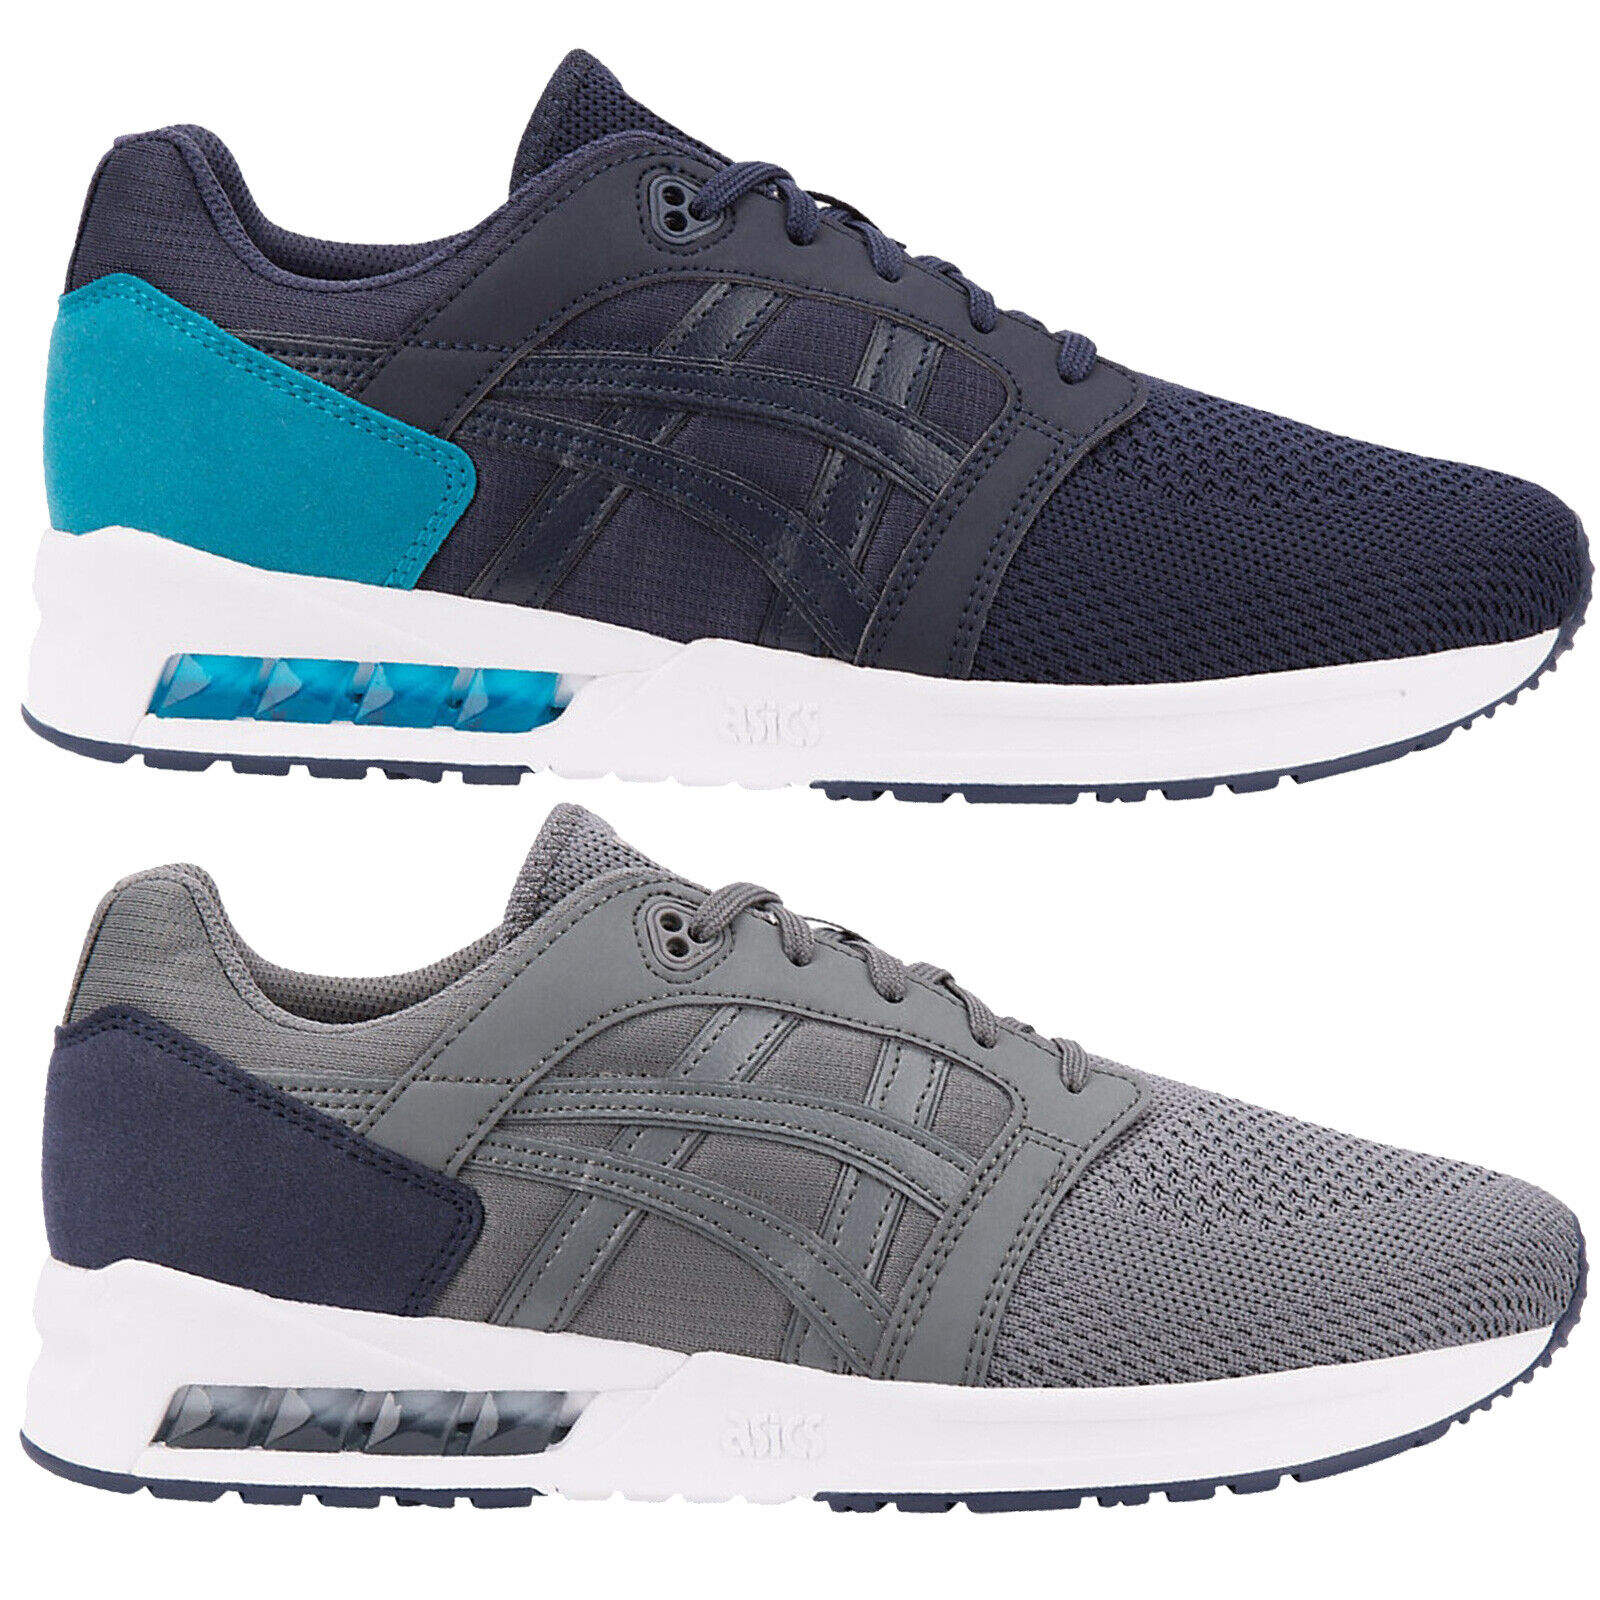 Asics Tiger Gel-Saga Sou Men's Trainer Gel Saga Trainers Low shoes